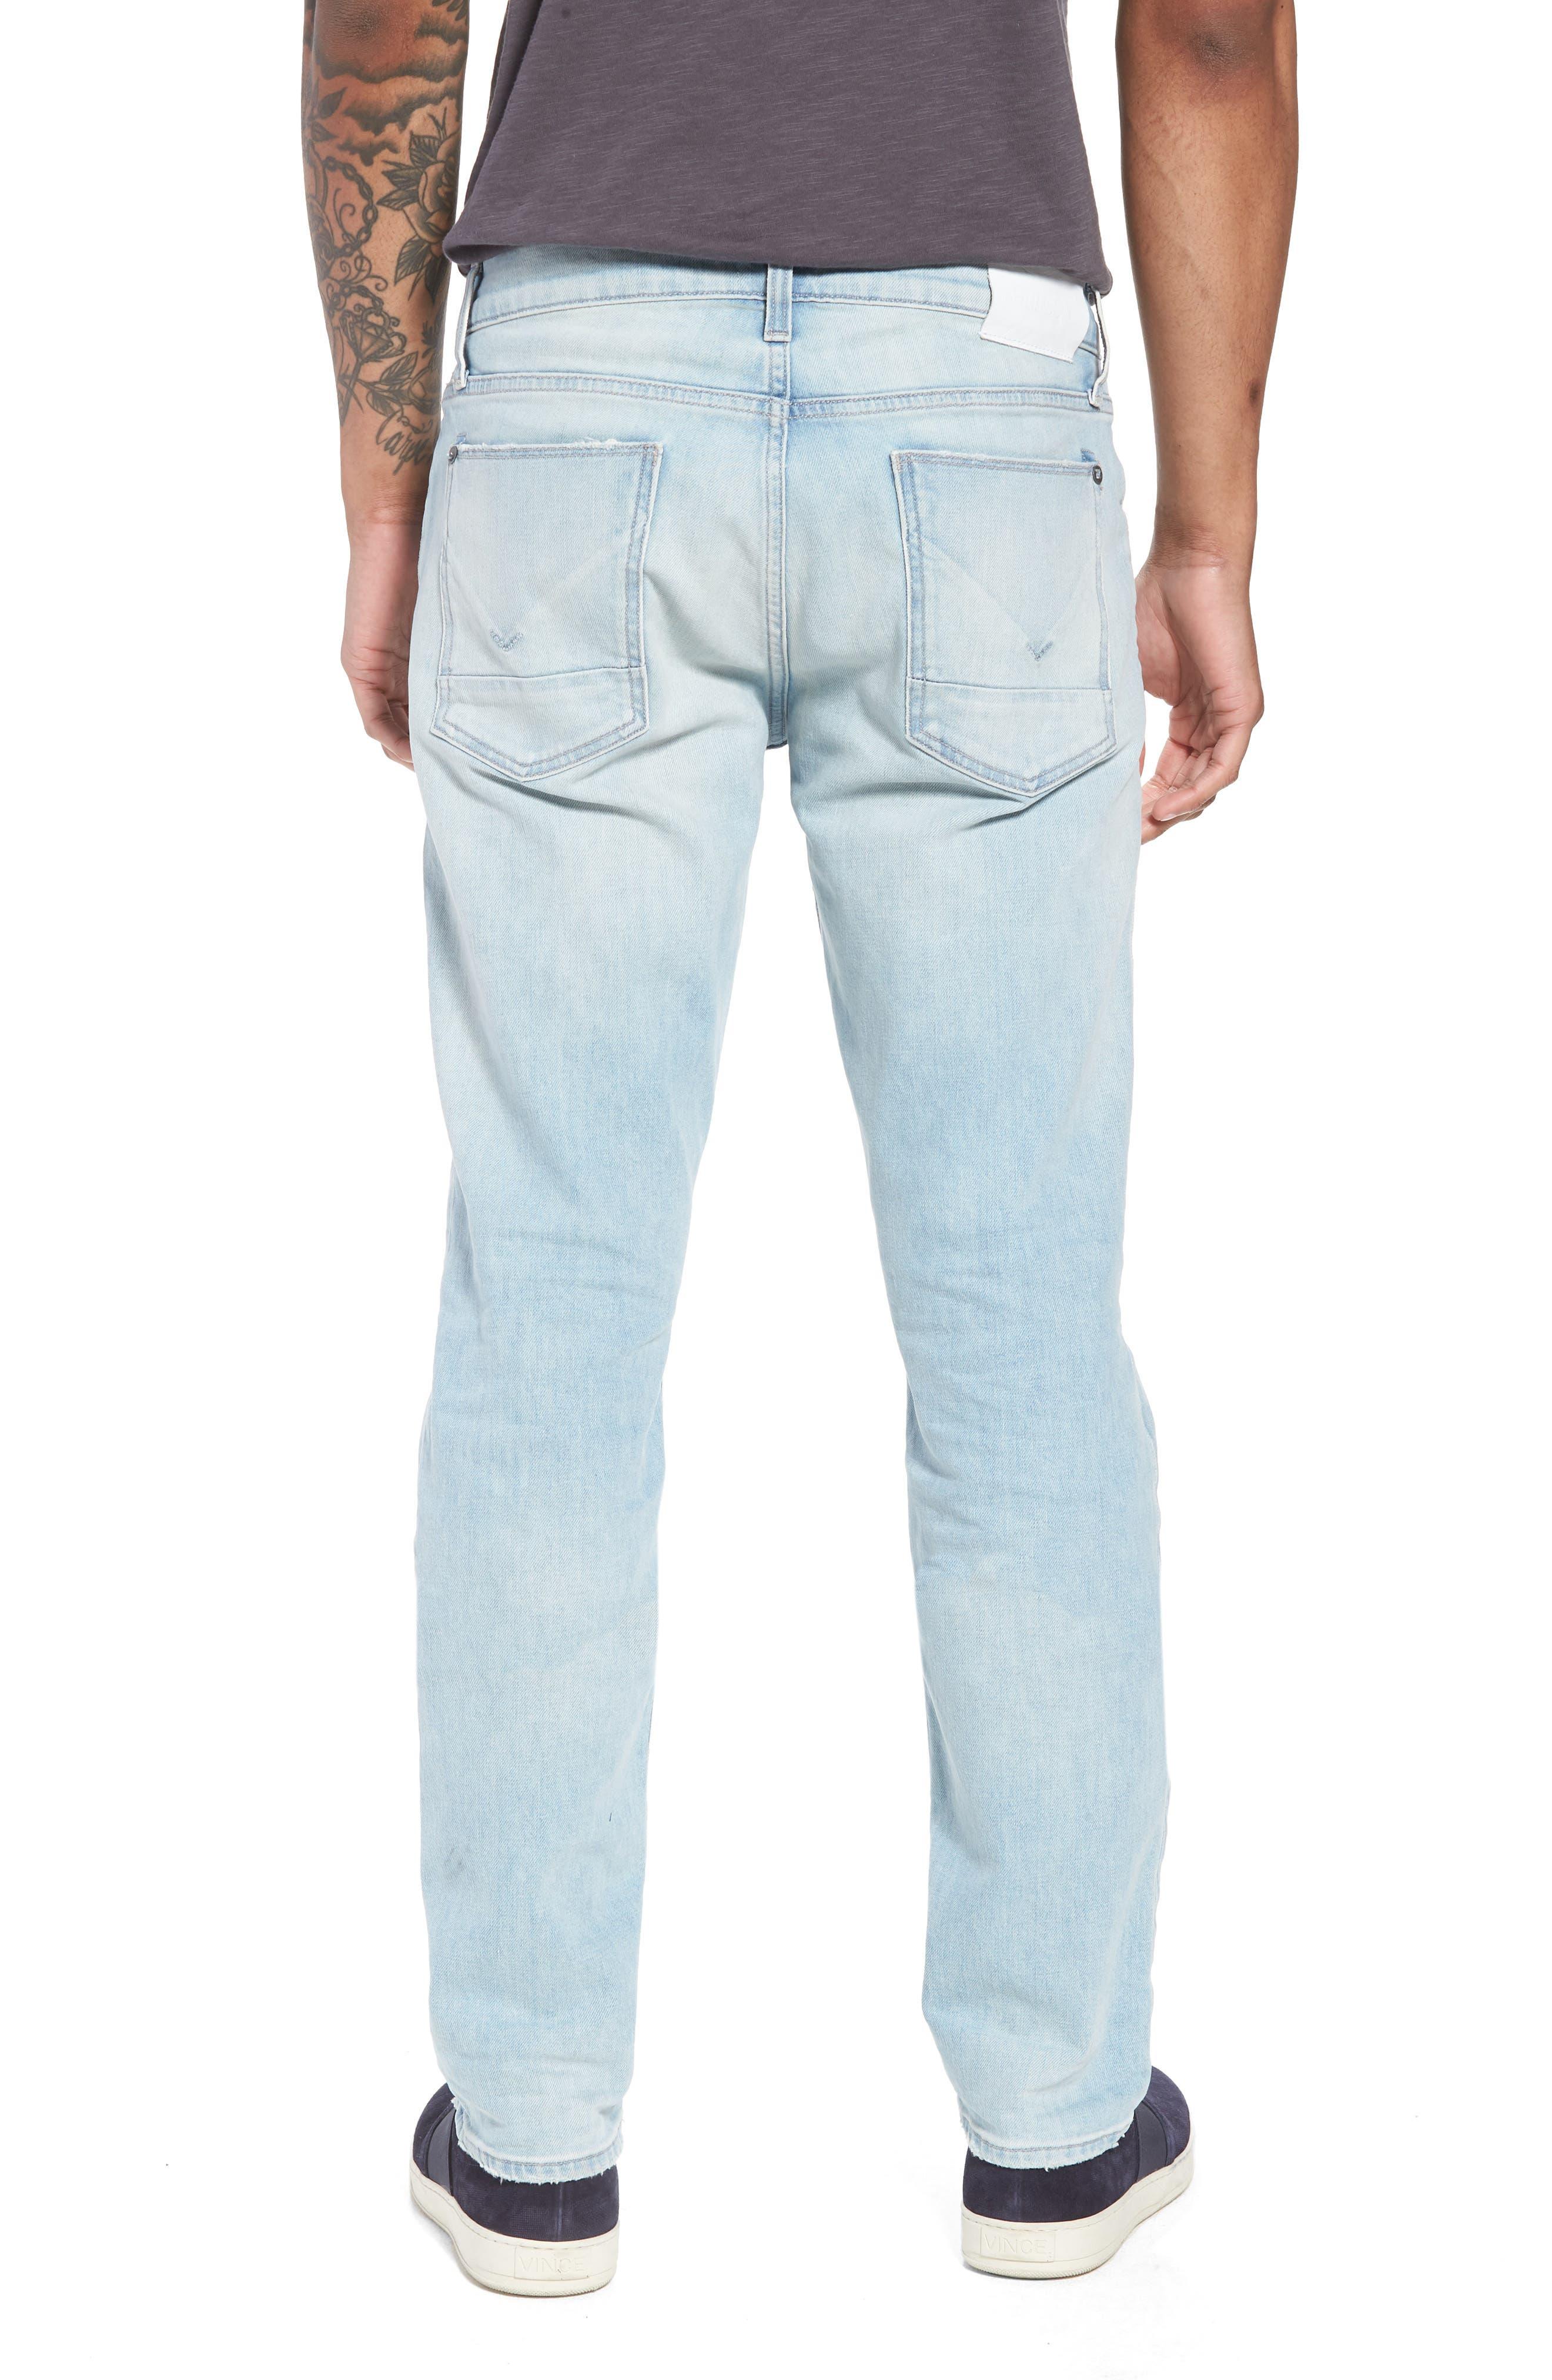 Blake Slim Fit Jeans,                             Alternate thumbnail 2, color,                             Rewired